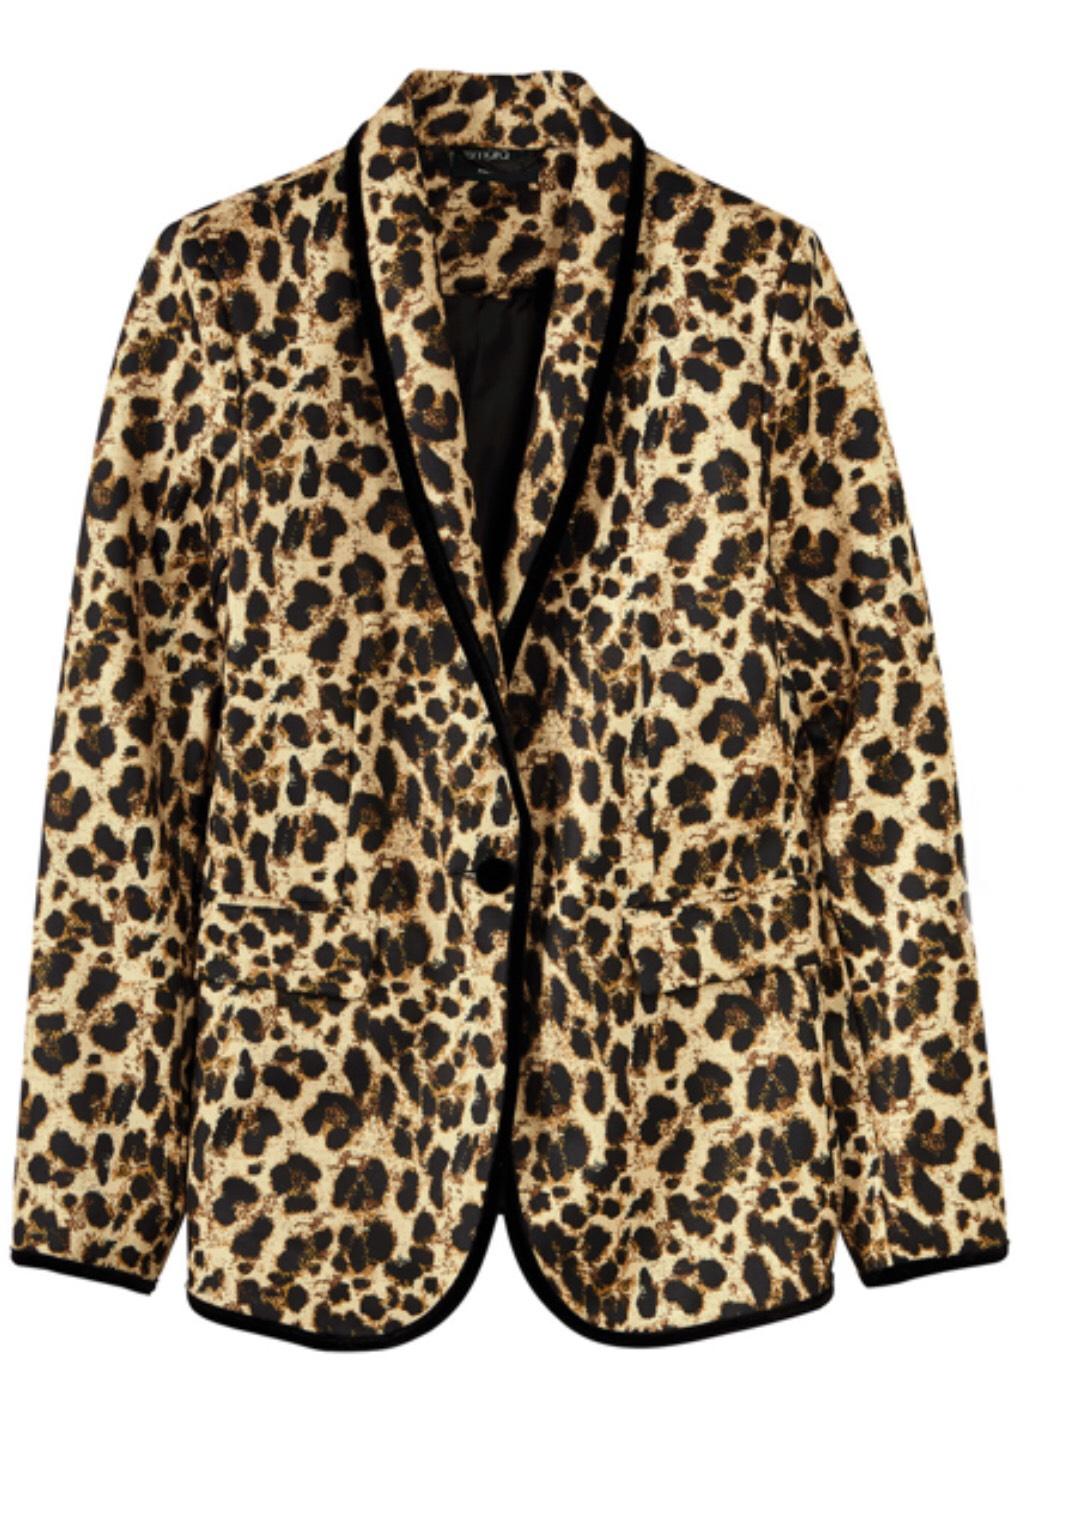 Blazer Heidi Klum Esmara [Half Price] £8.49 at Lidl from 28/06